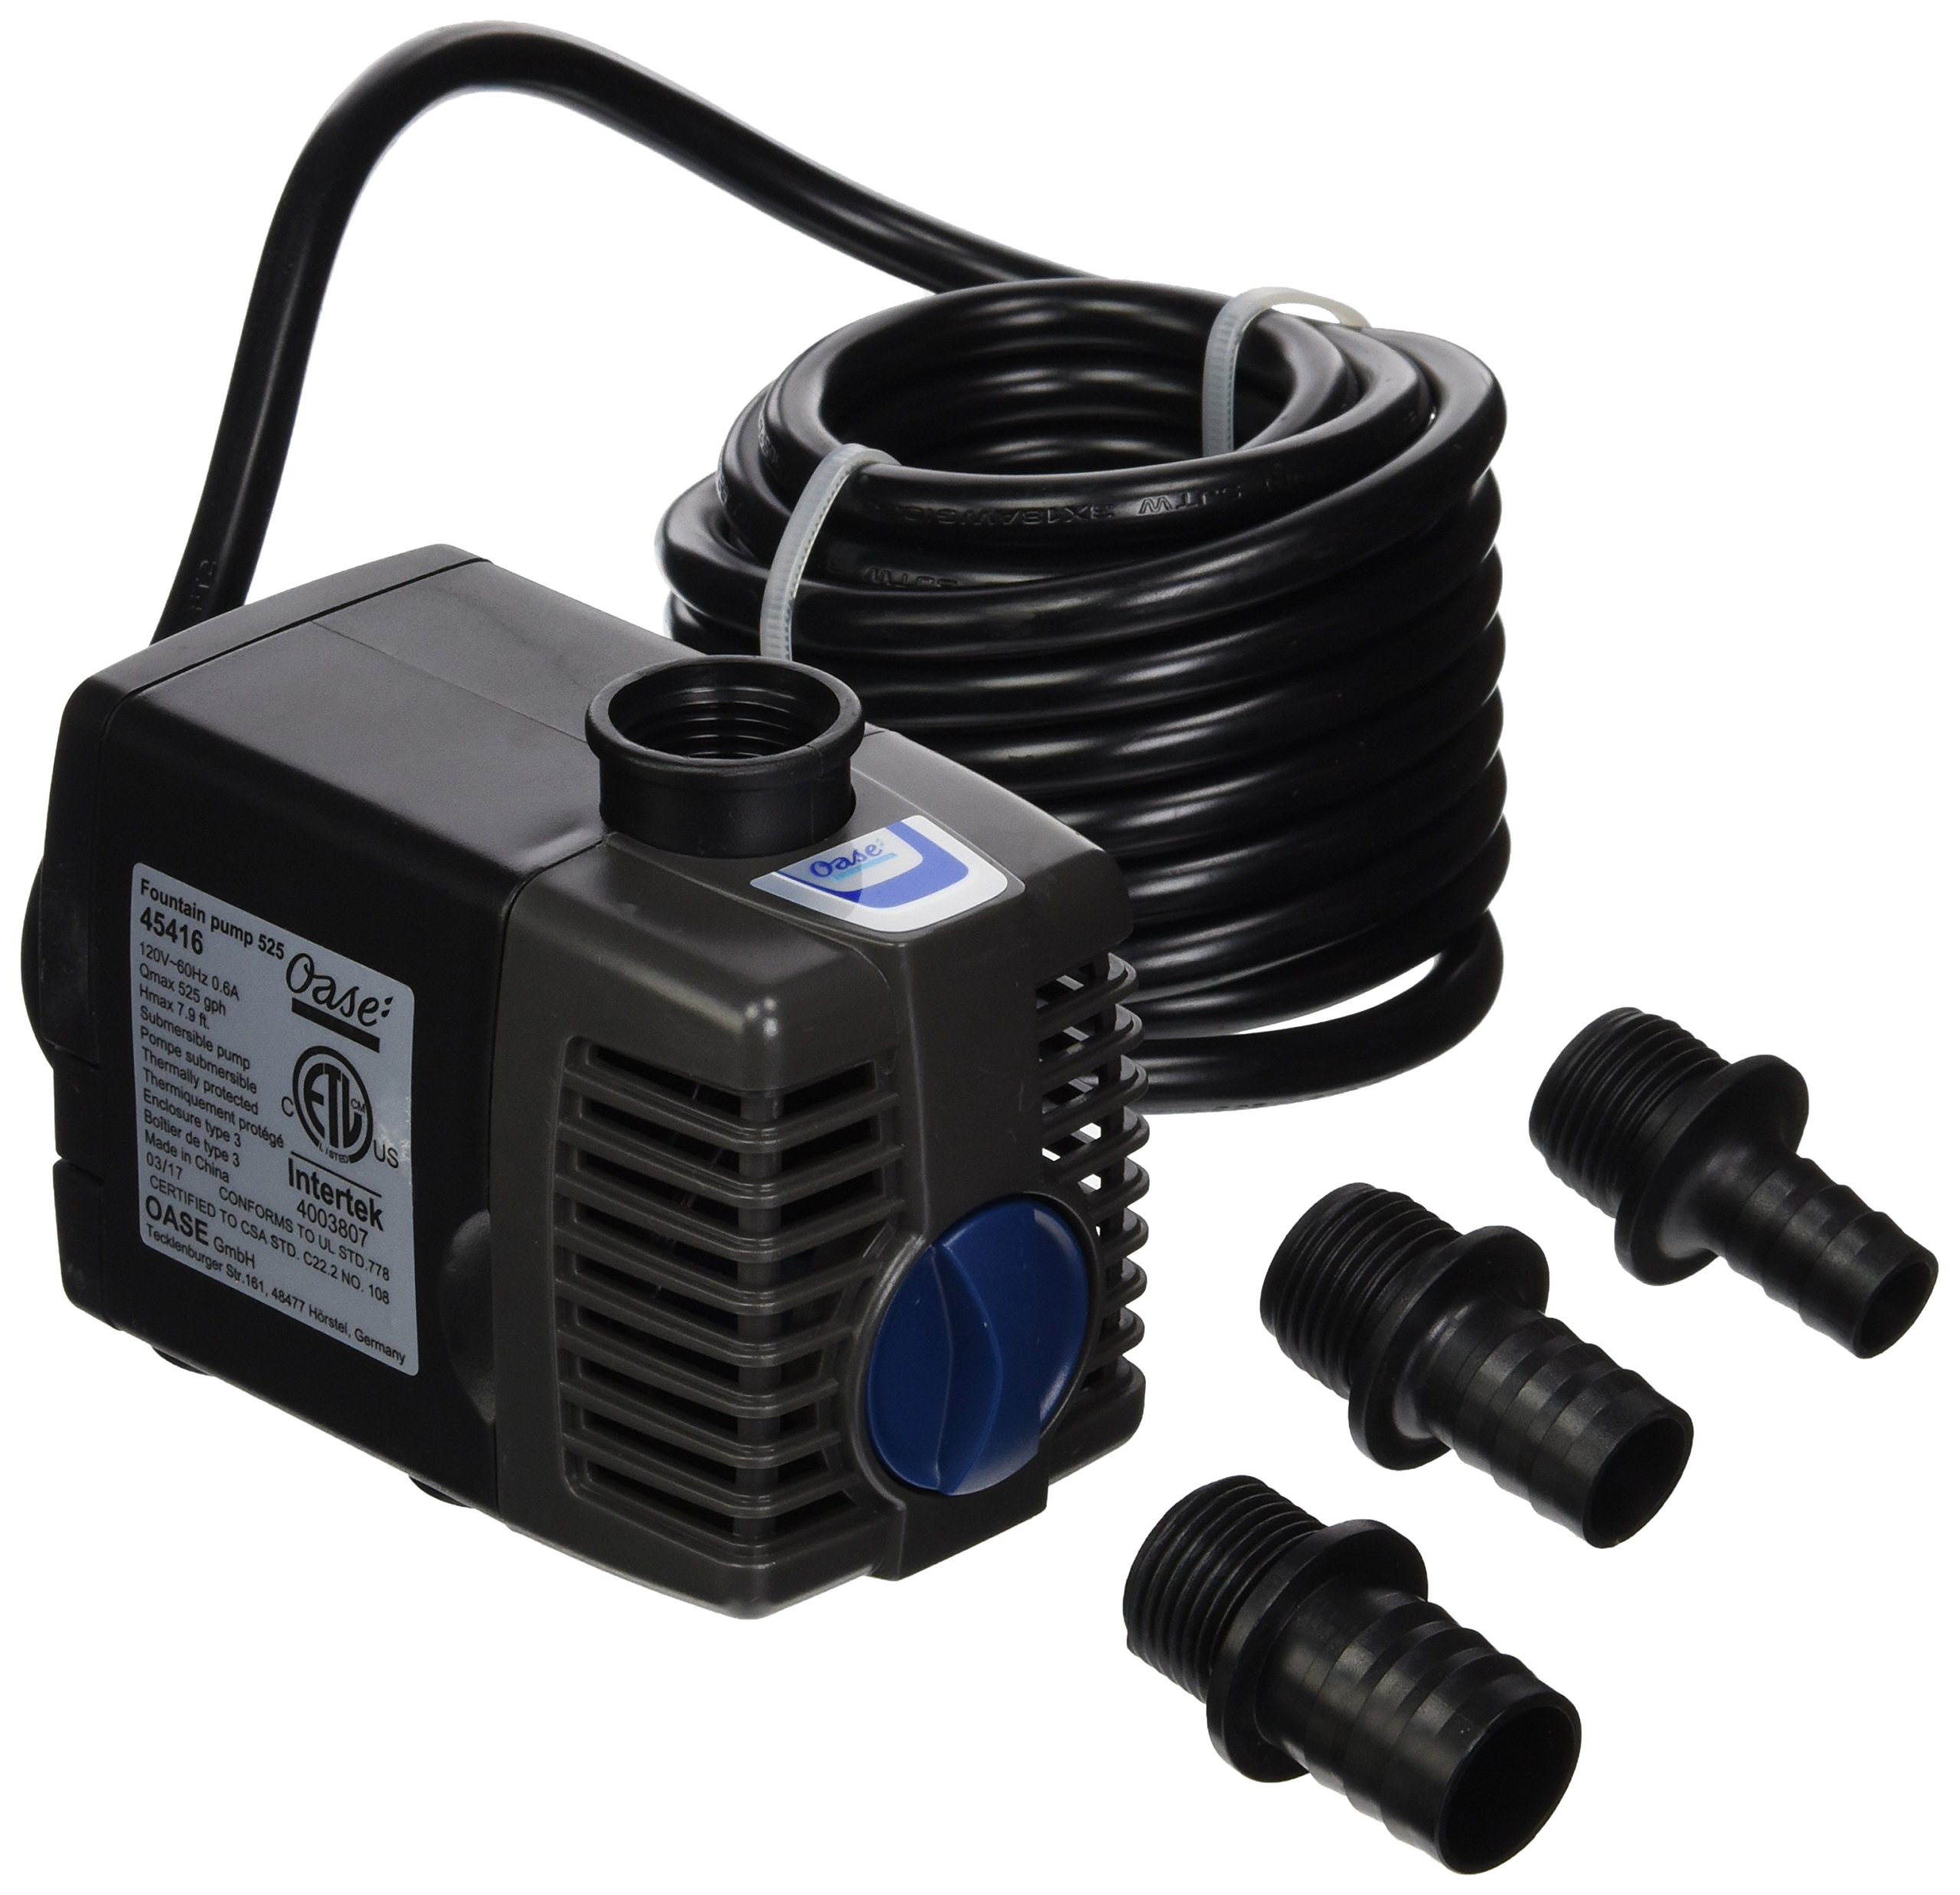 OASE 45416 525 gallon/hr Fountain Pump